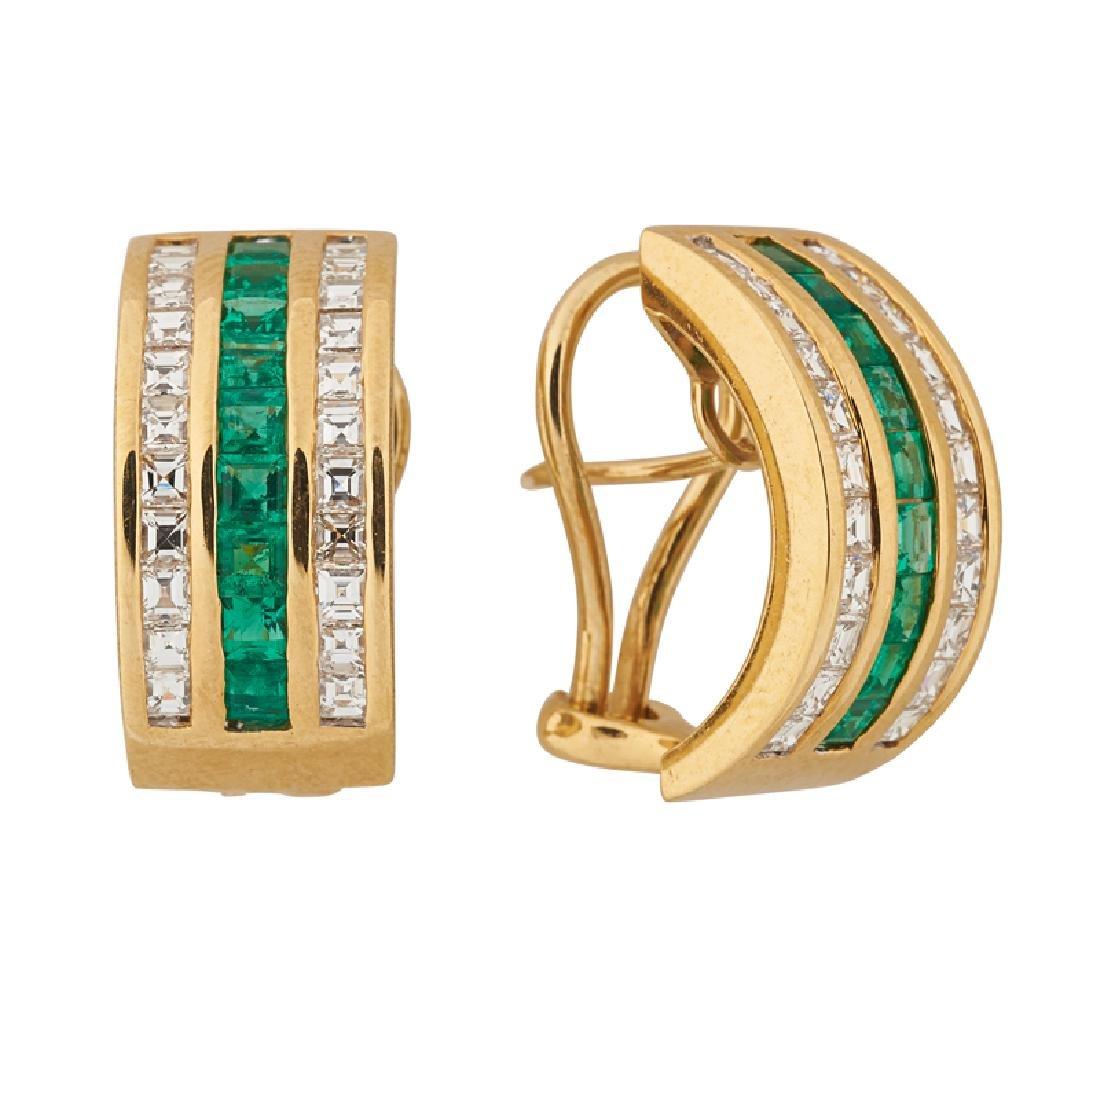 EMERALD, DIAMOND & YELLOW GOLD HUGGIE EARRINGS